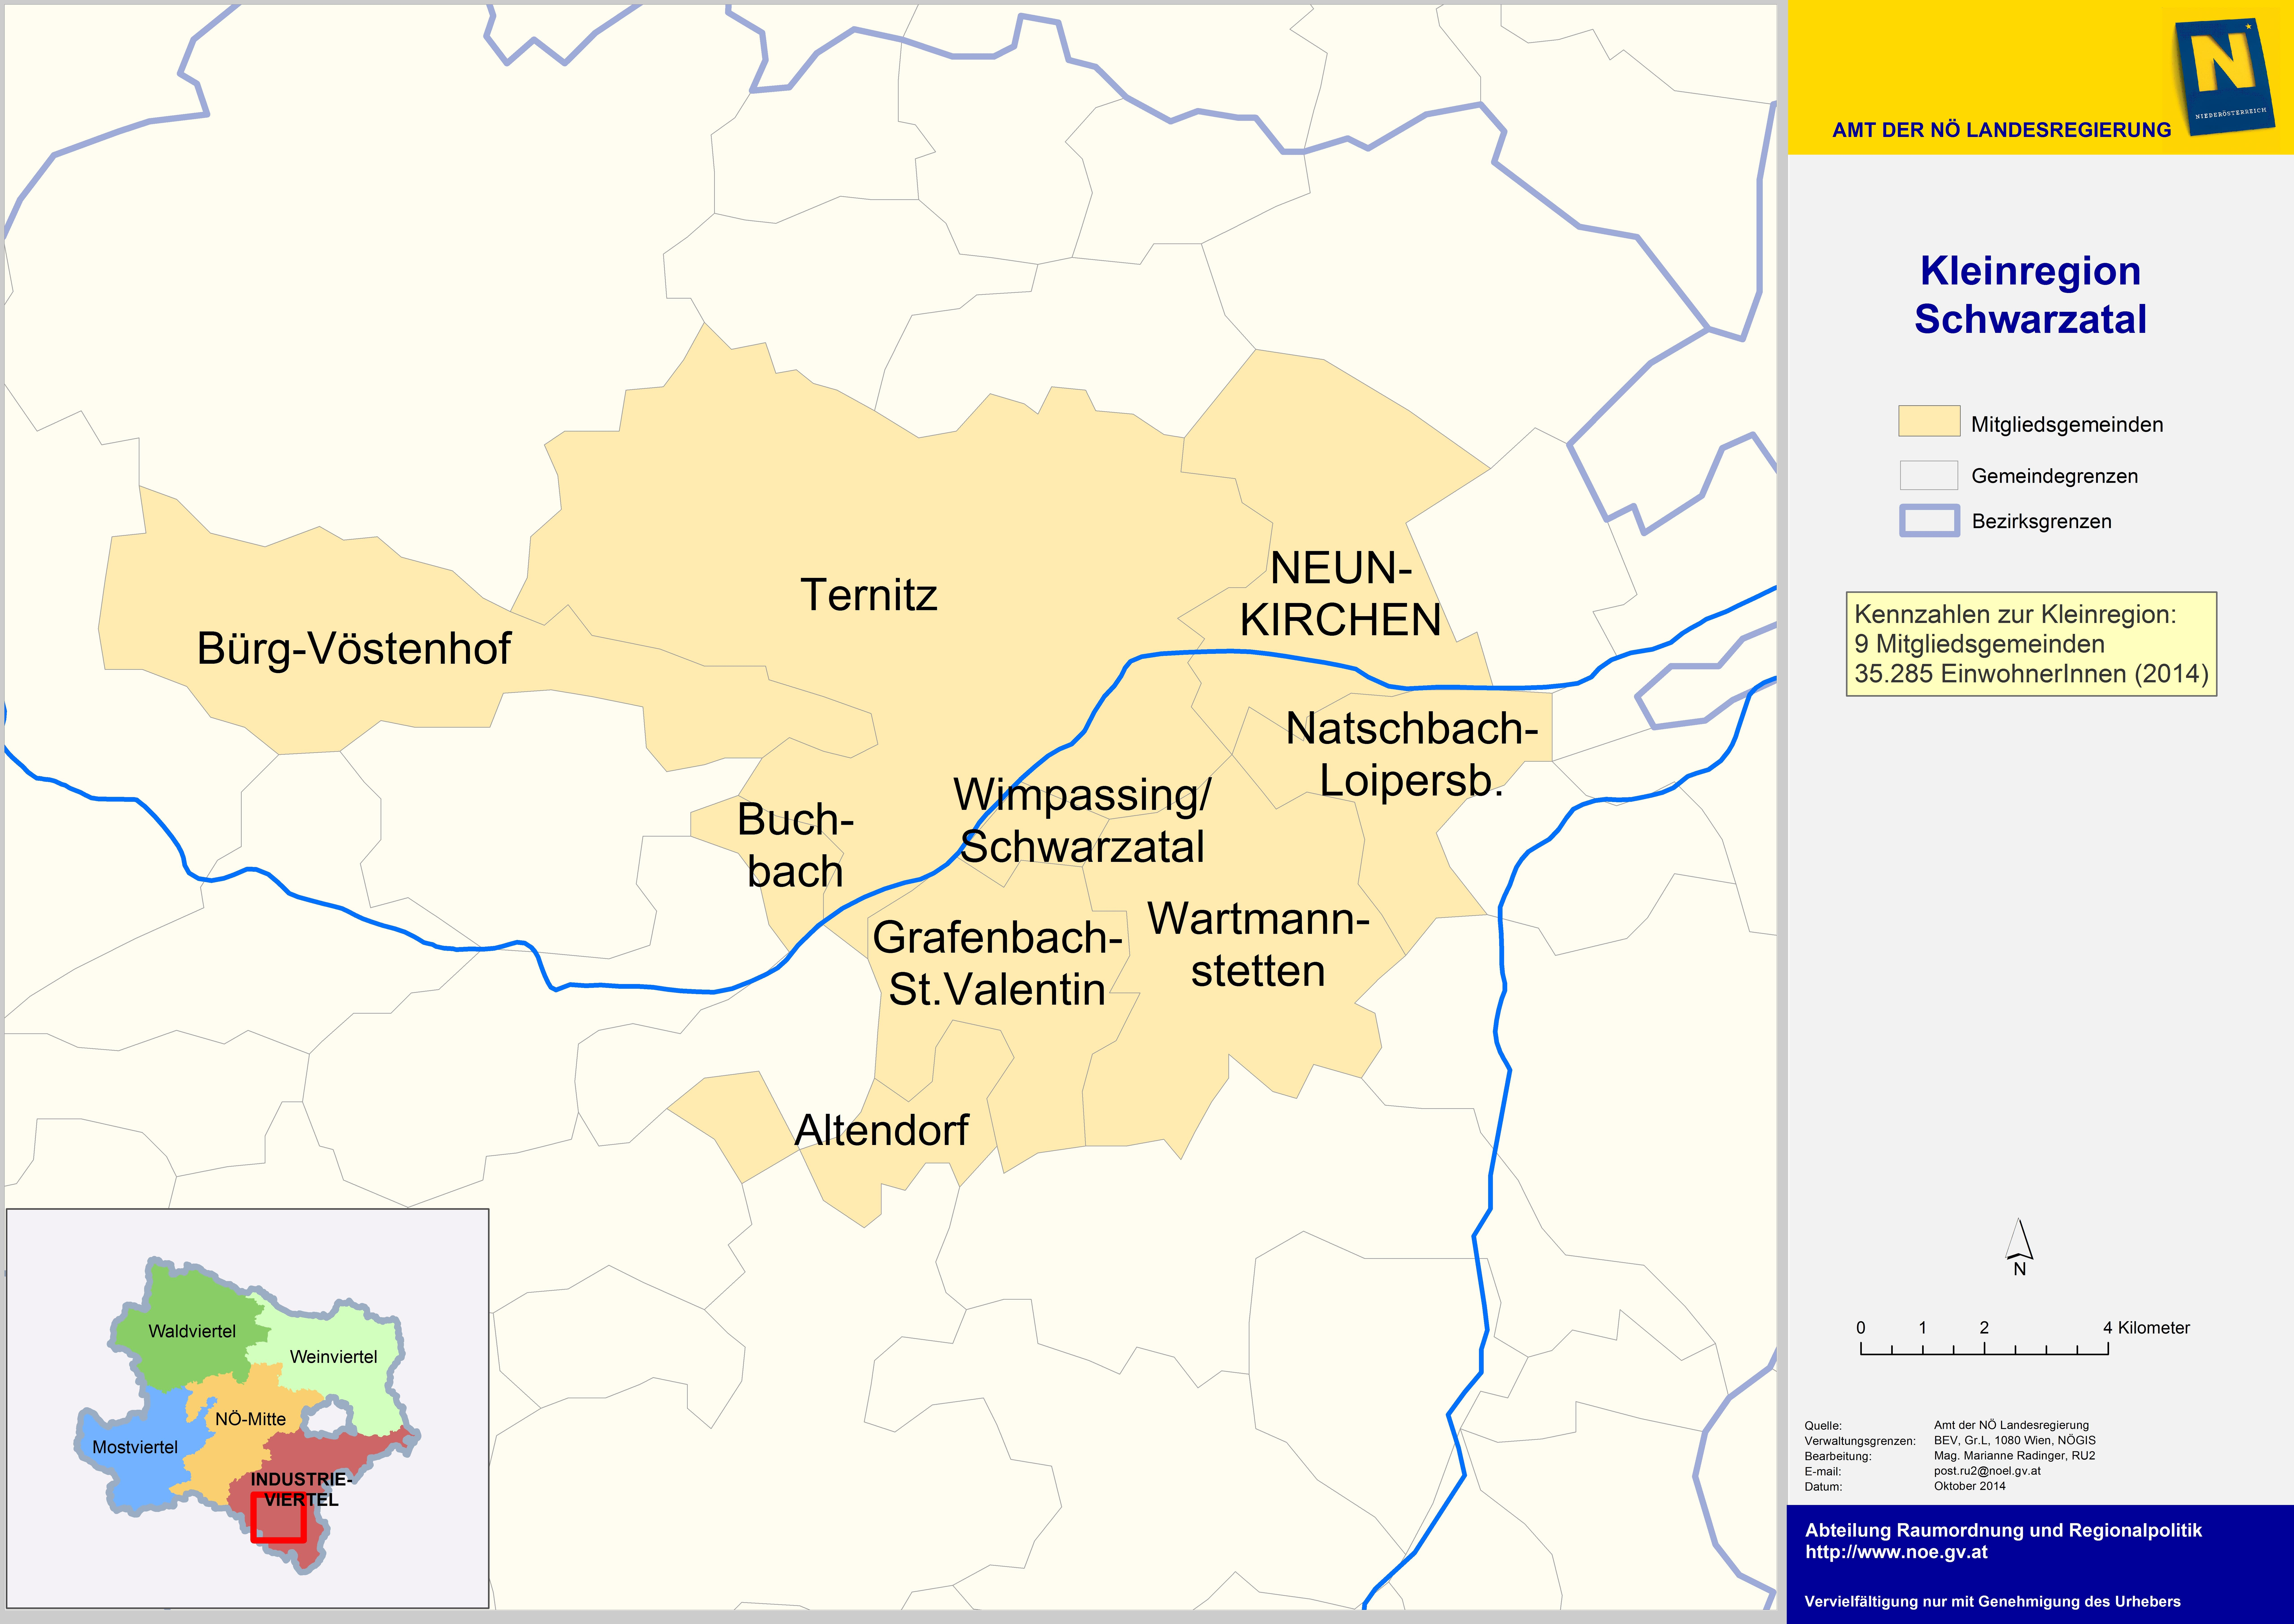 Region S Karte.Karte Kleinregion Schwarzatal